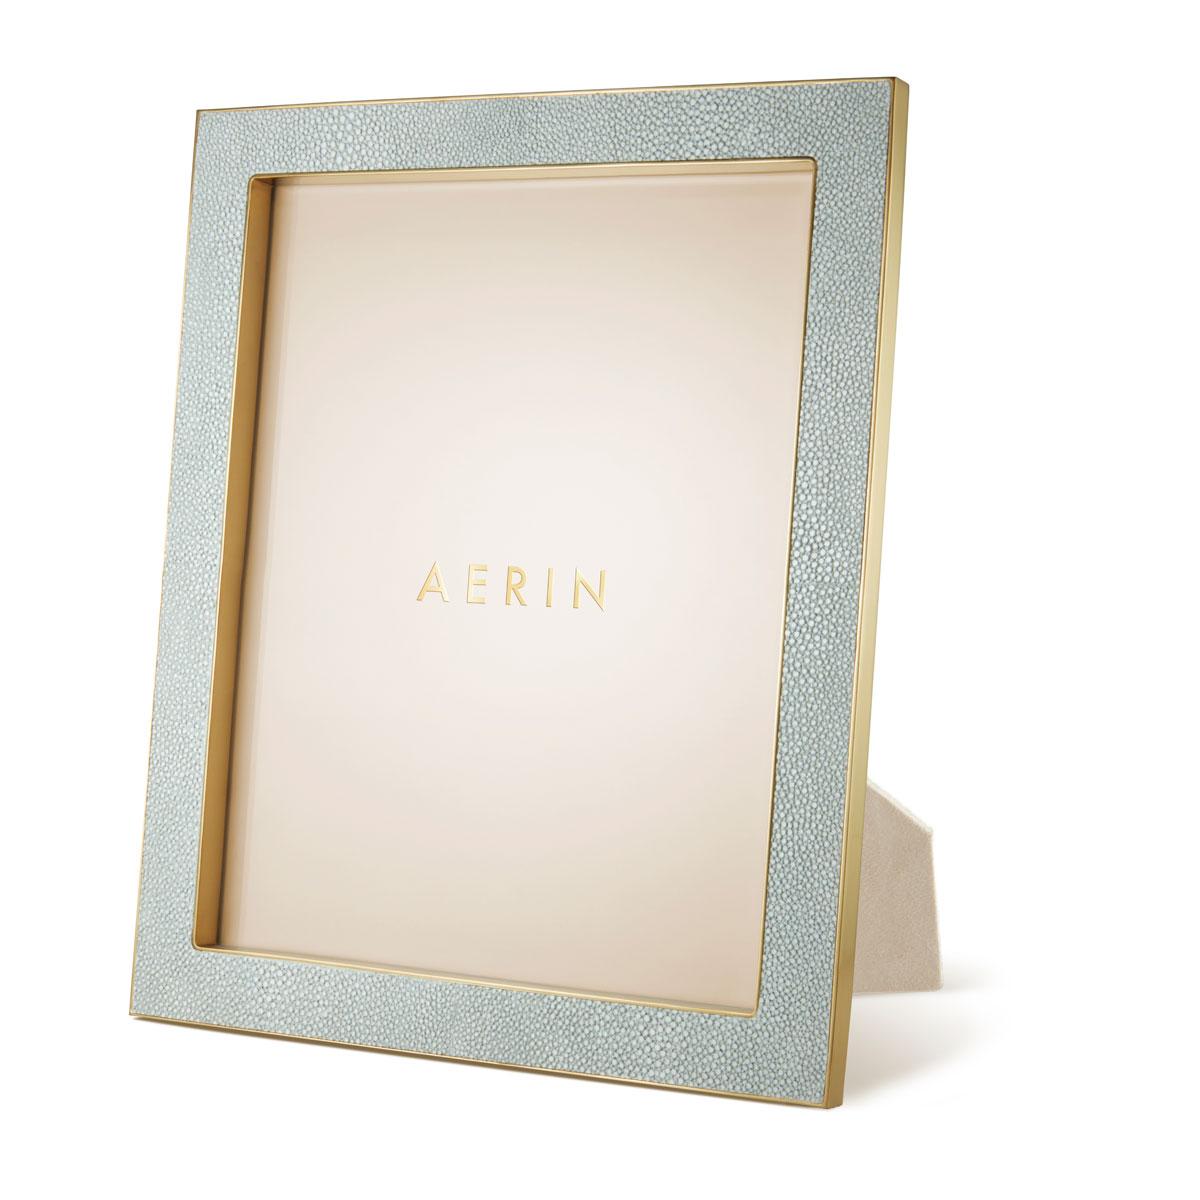 "Aerin Classic Shagreen Frame, Mist 8x10"""